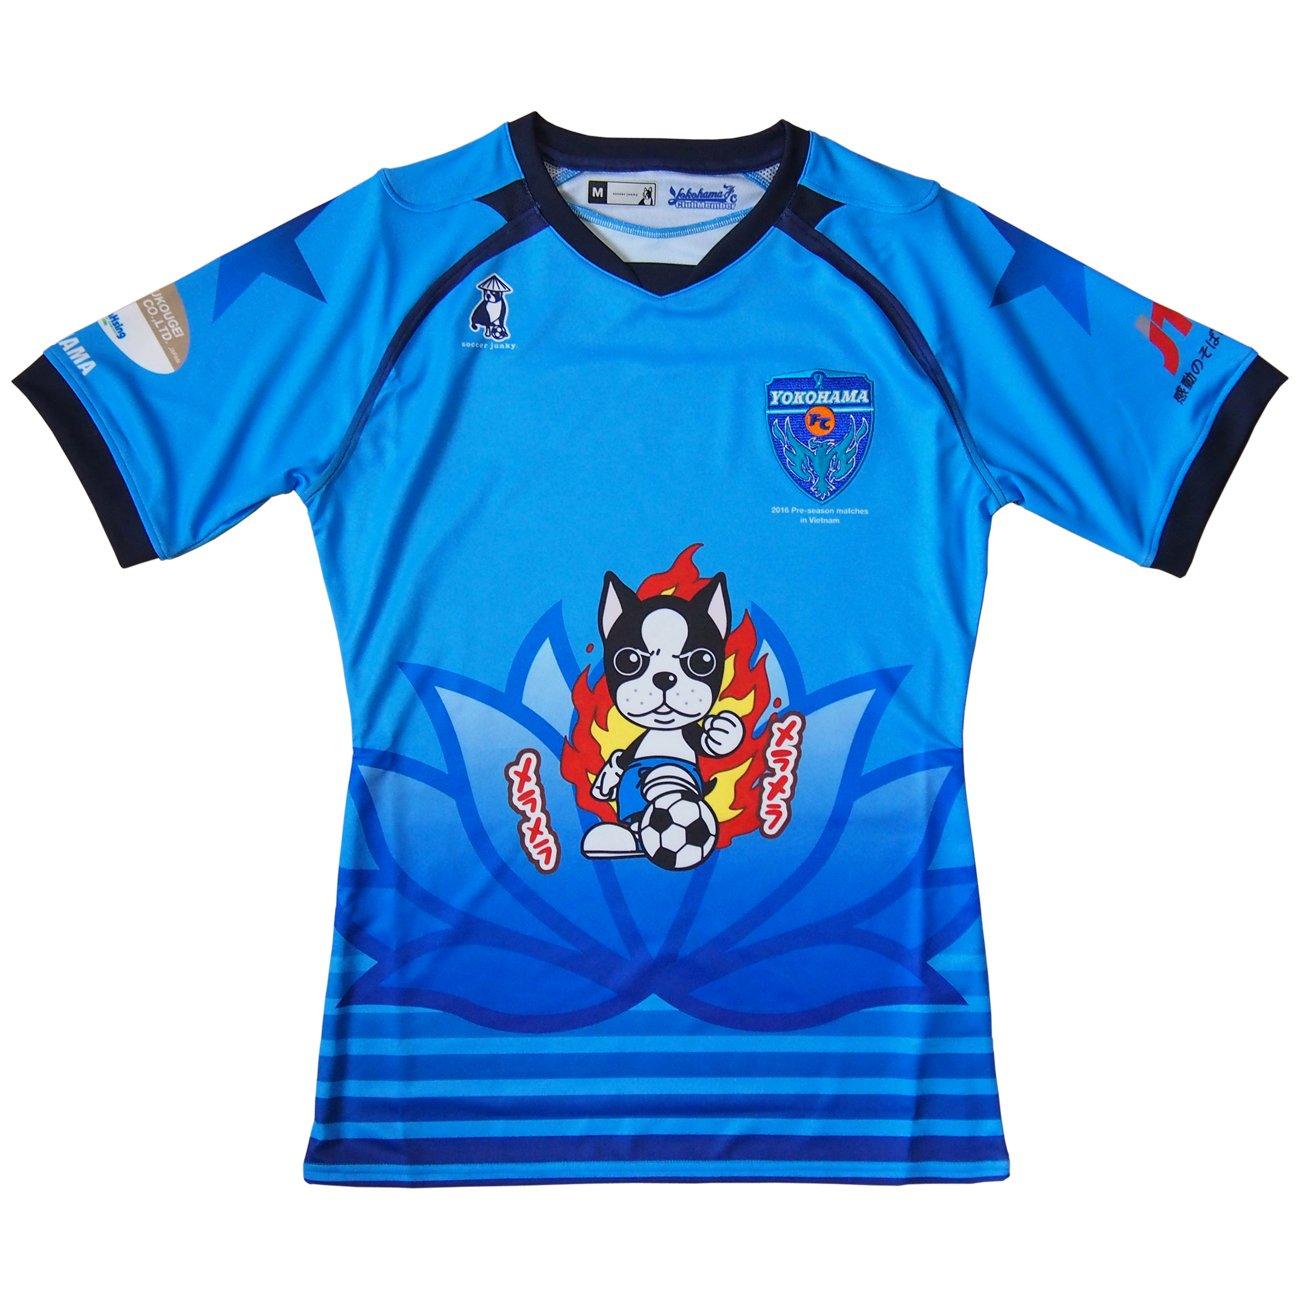 Soccer Junky(サッカージャンキー) 2016 横浜FC ベトナムキャンプ ユニフォーム ブルー YSJ16160-57 B01D81Q6FA O